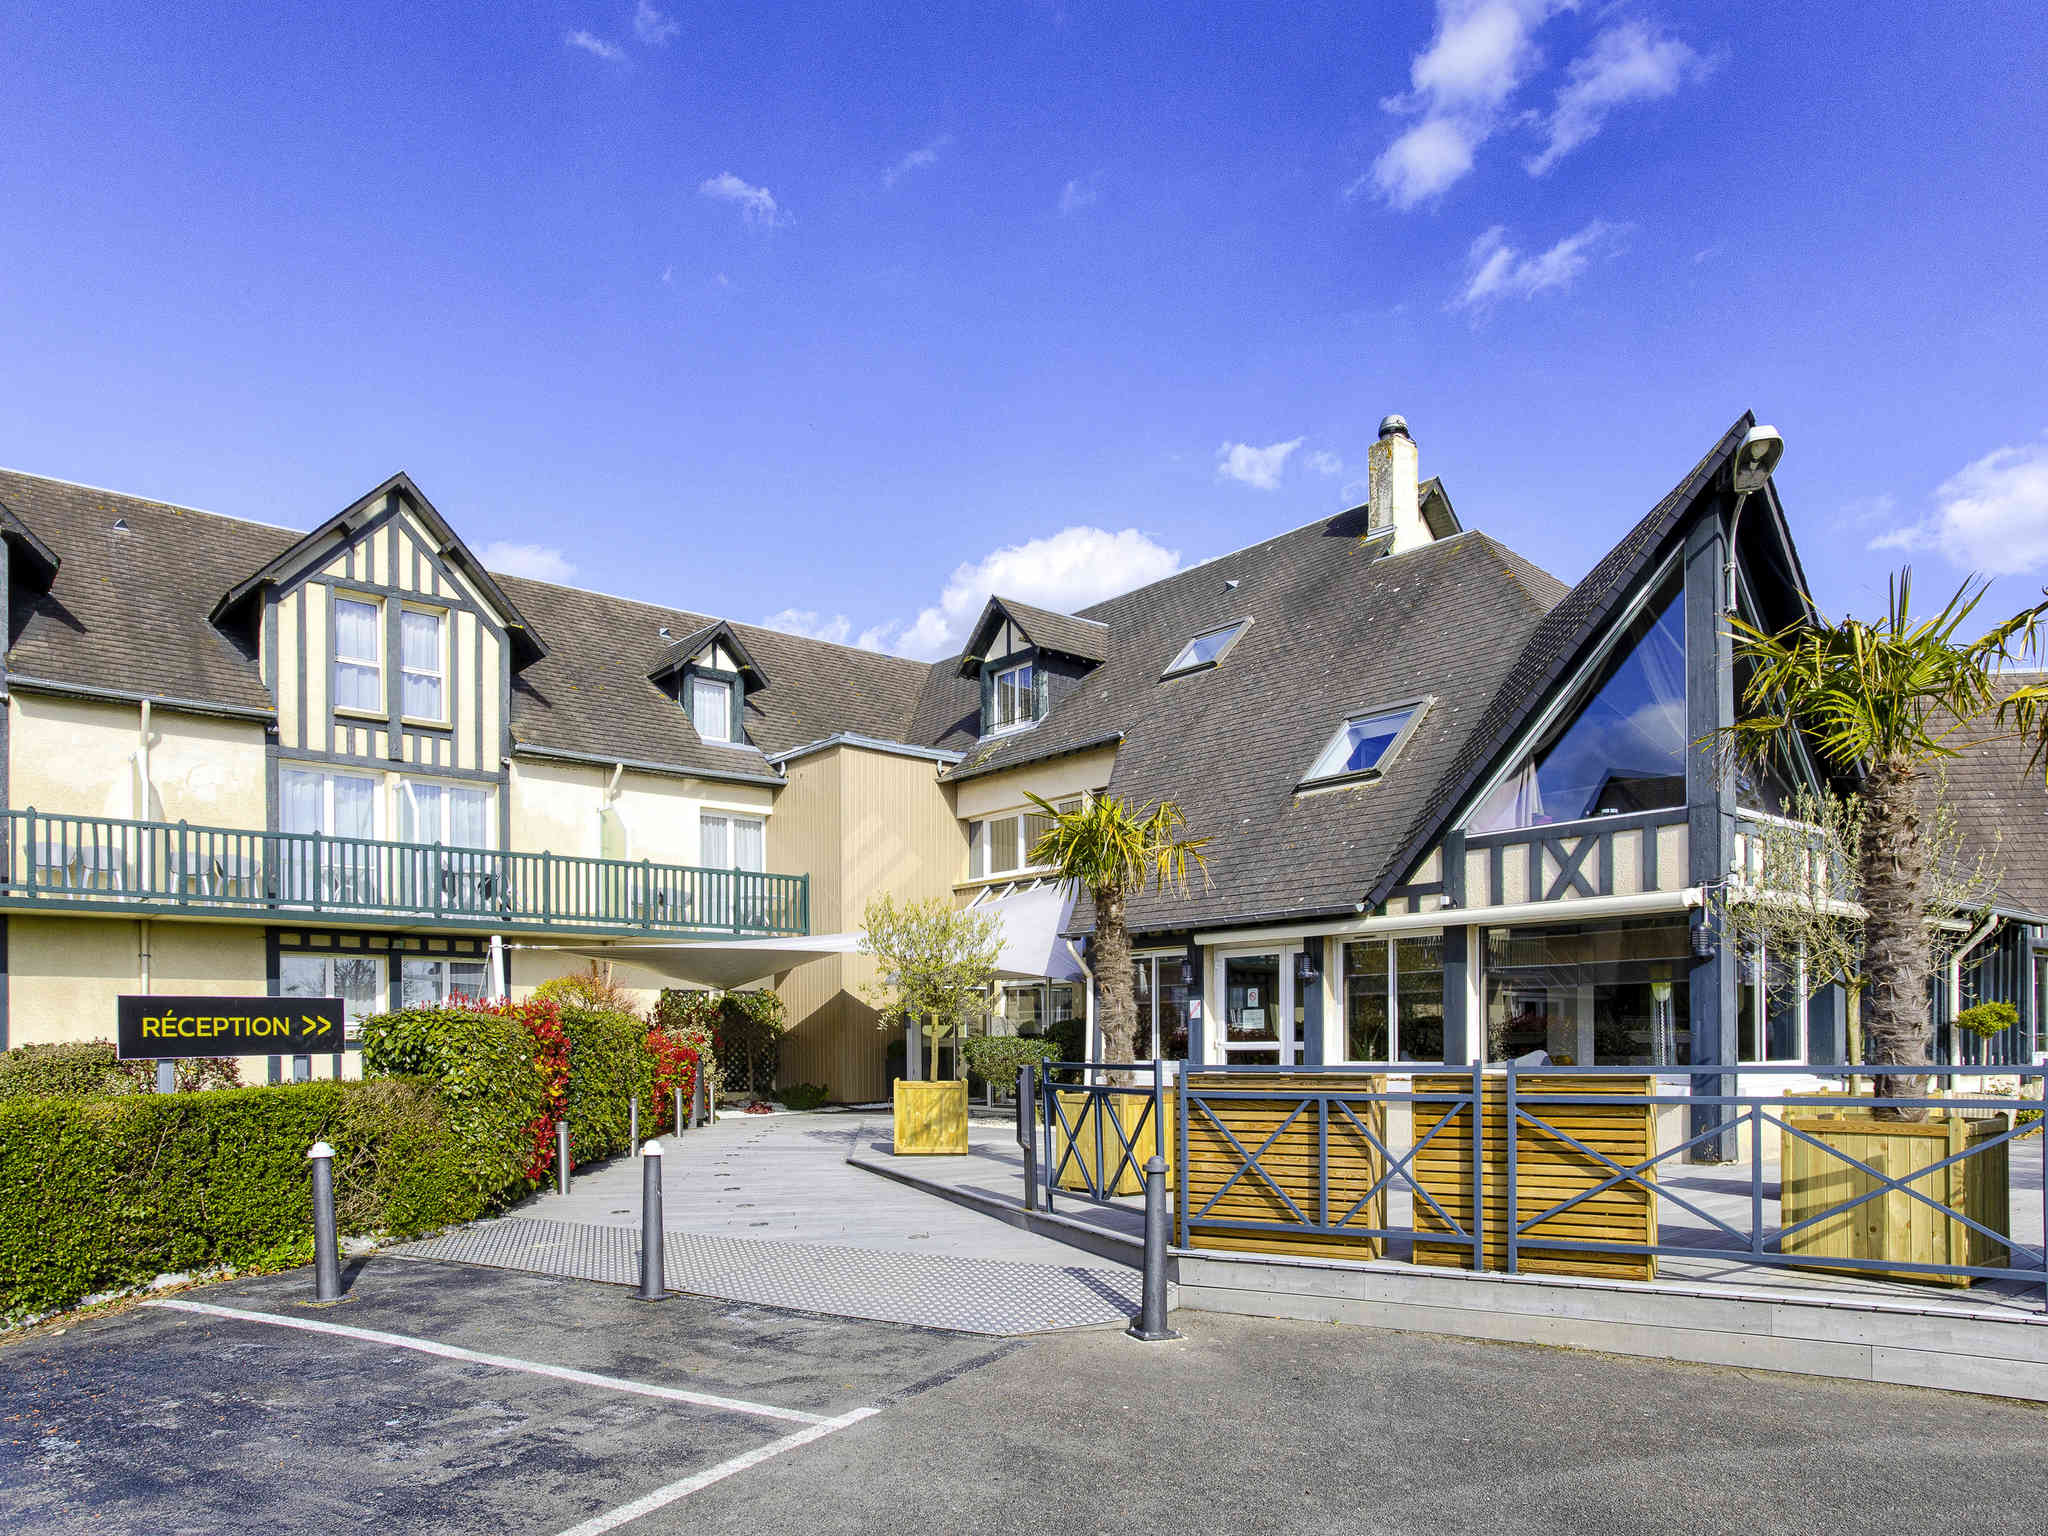 Hotell – Hôtel Mercure Cabourg Hippodrome